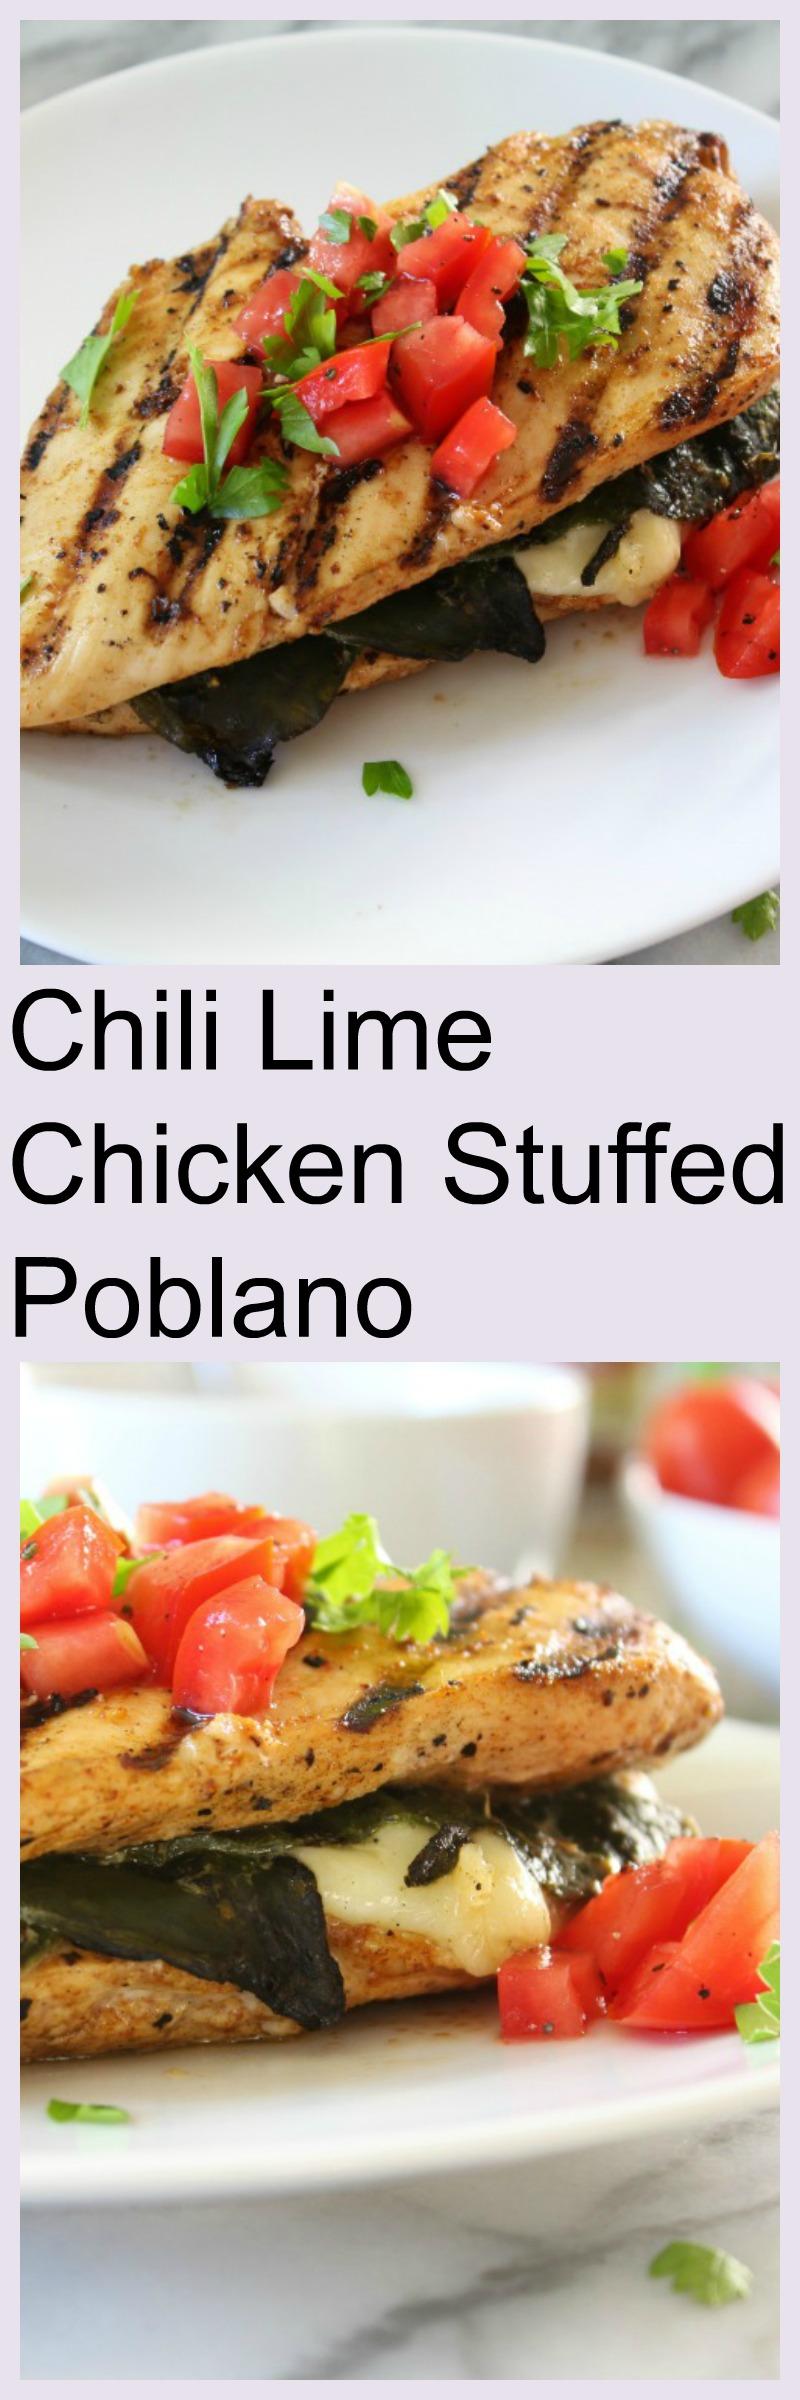 Chili Lime Chicken Stuffed Poblano